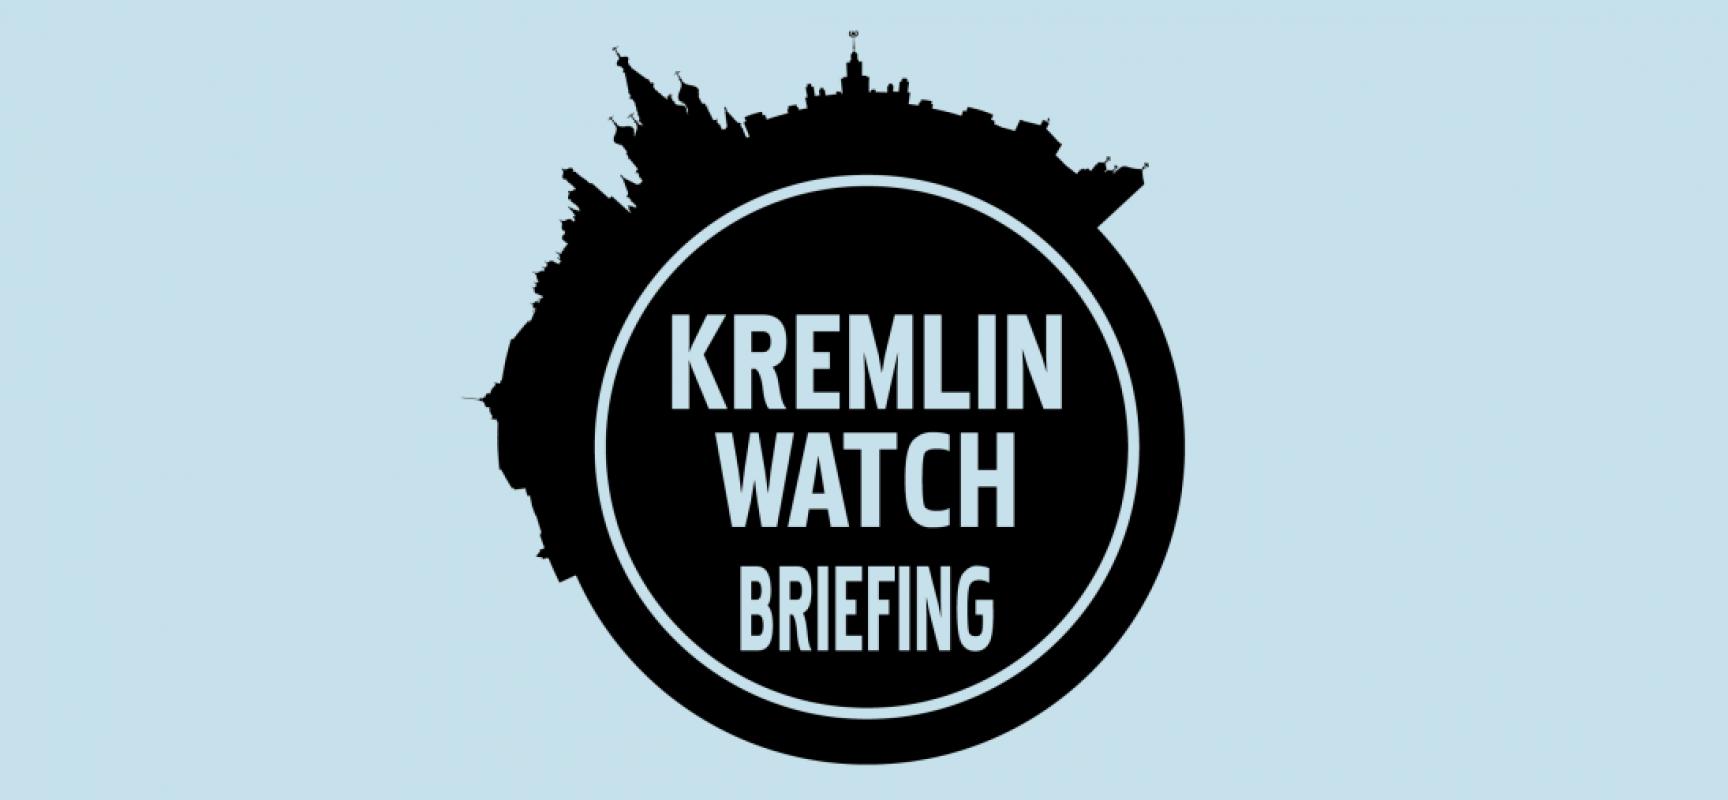 Kremlin Watch Briefing, October 24, 2017